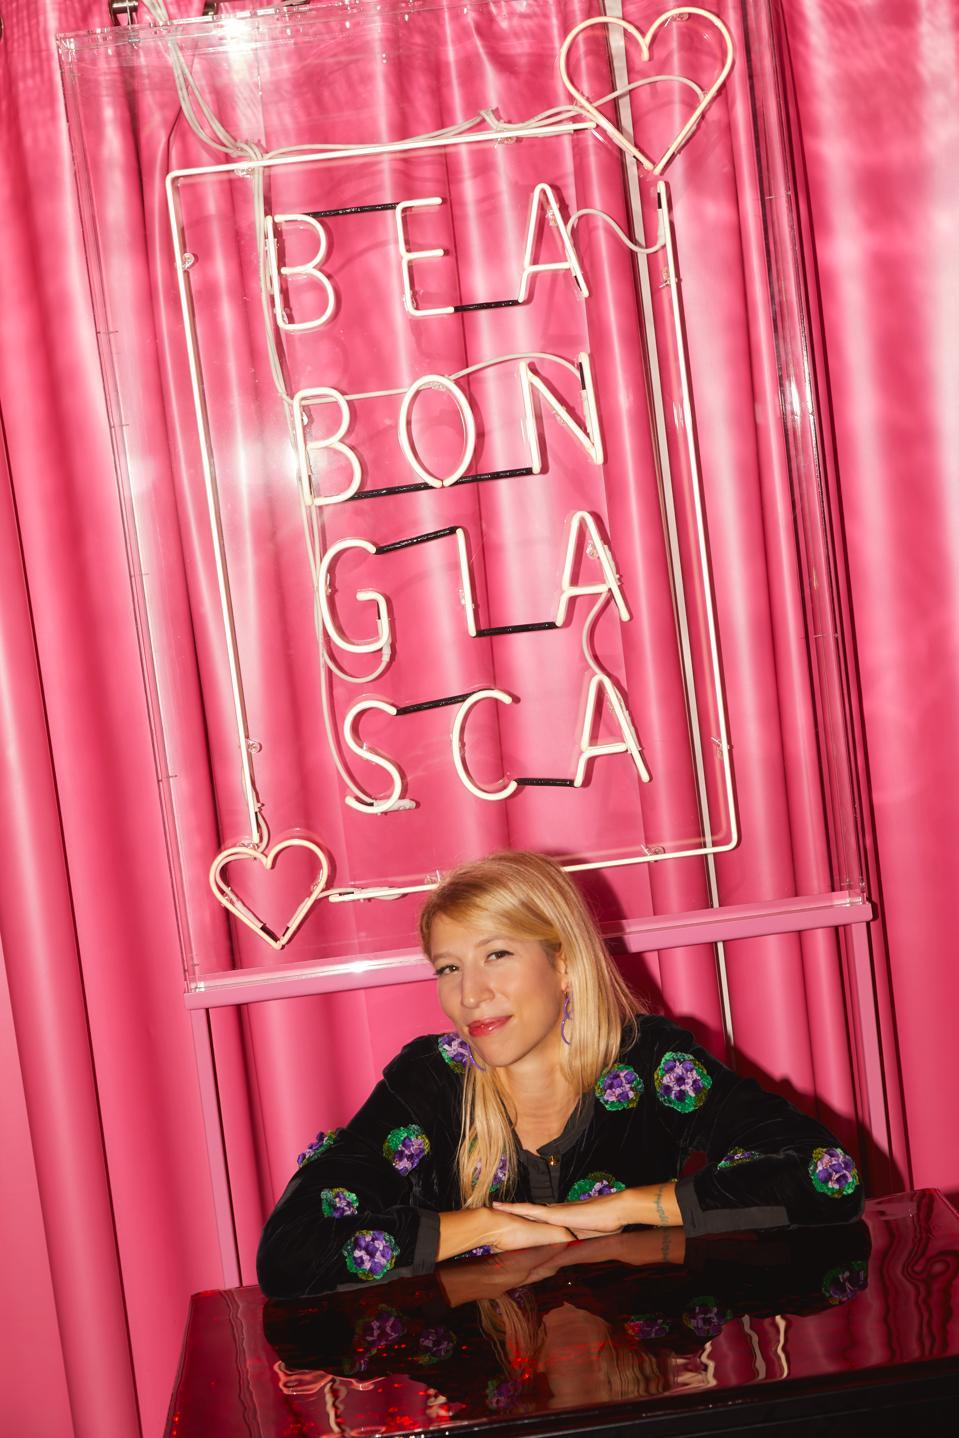 Bea Bongiasca